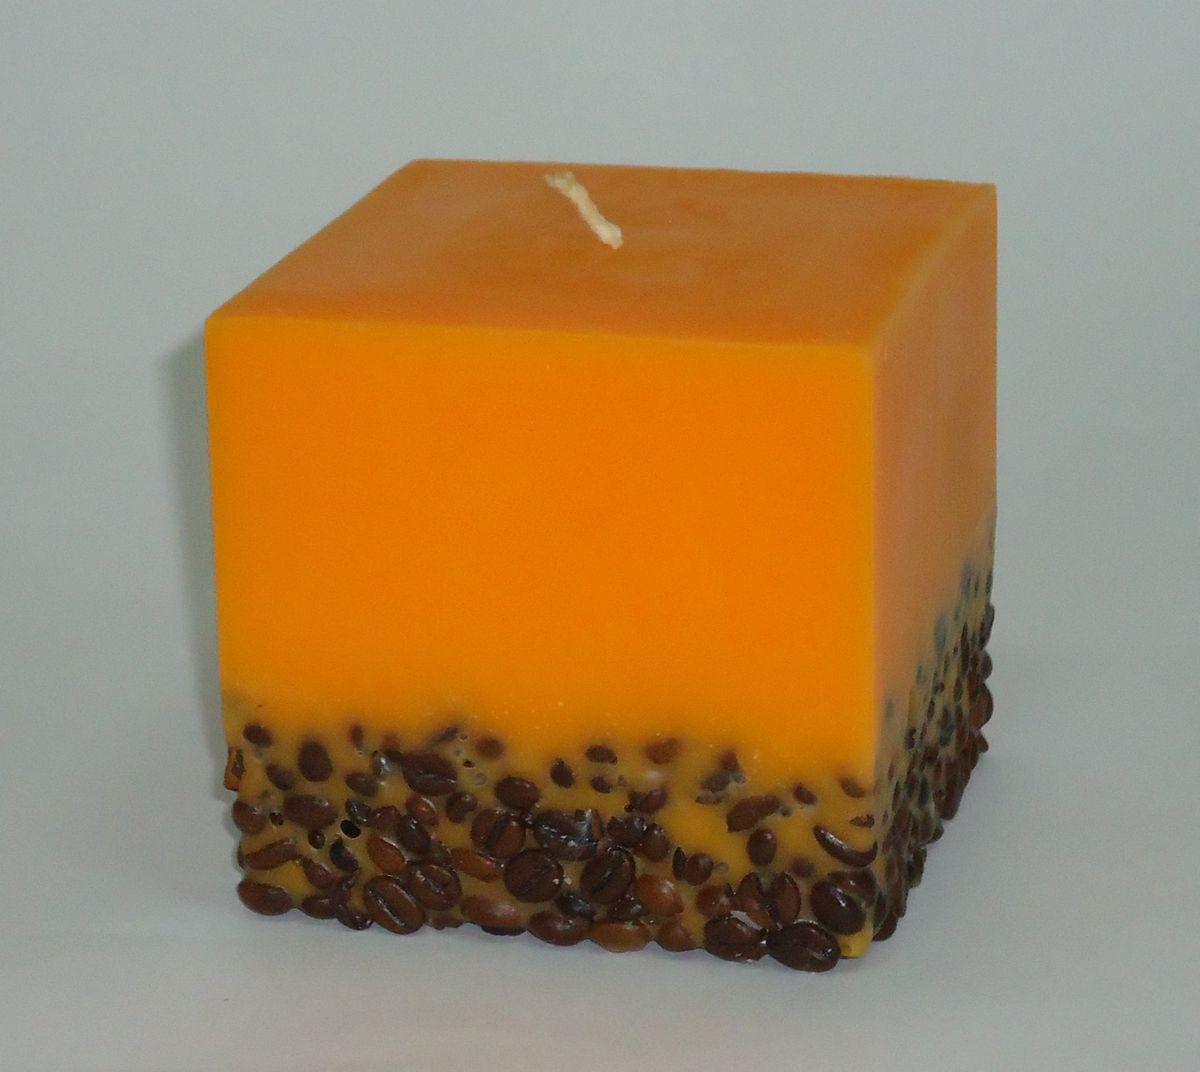 Свеча декоративная PROFFI HOME Квадрат 9,5х9,5х9,5 (с кофе),цвет: оранжевыйPH5909